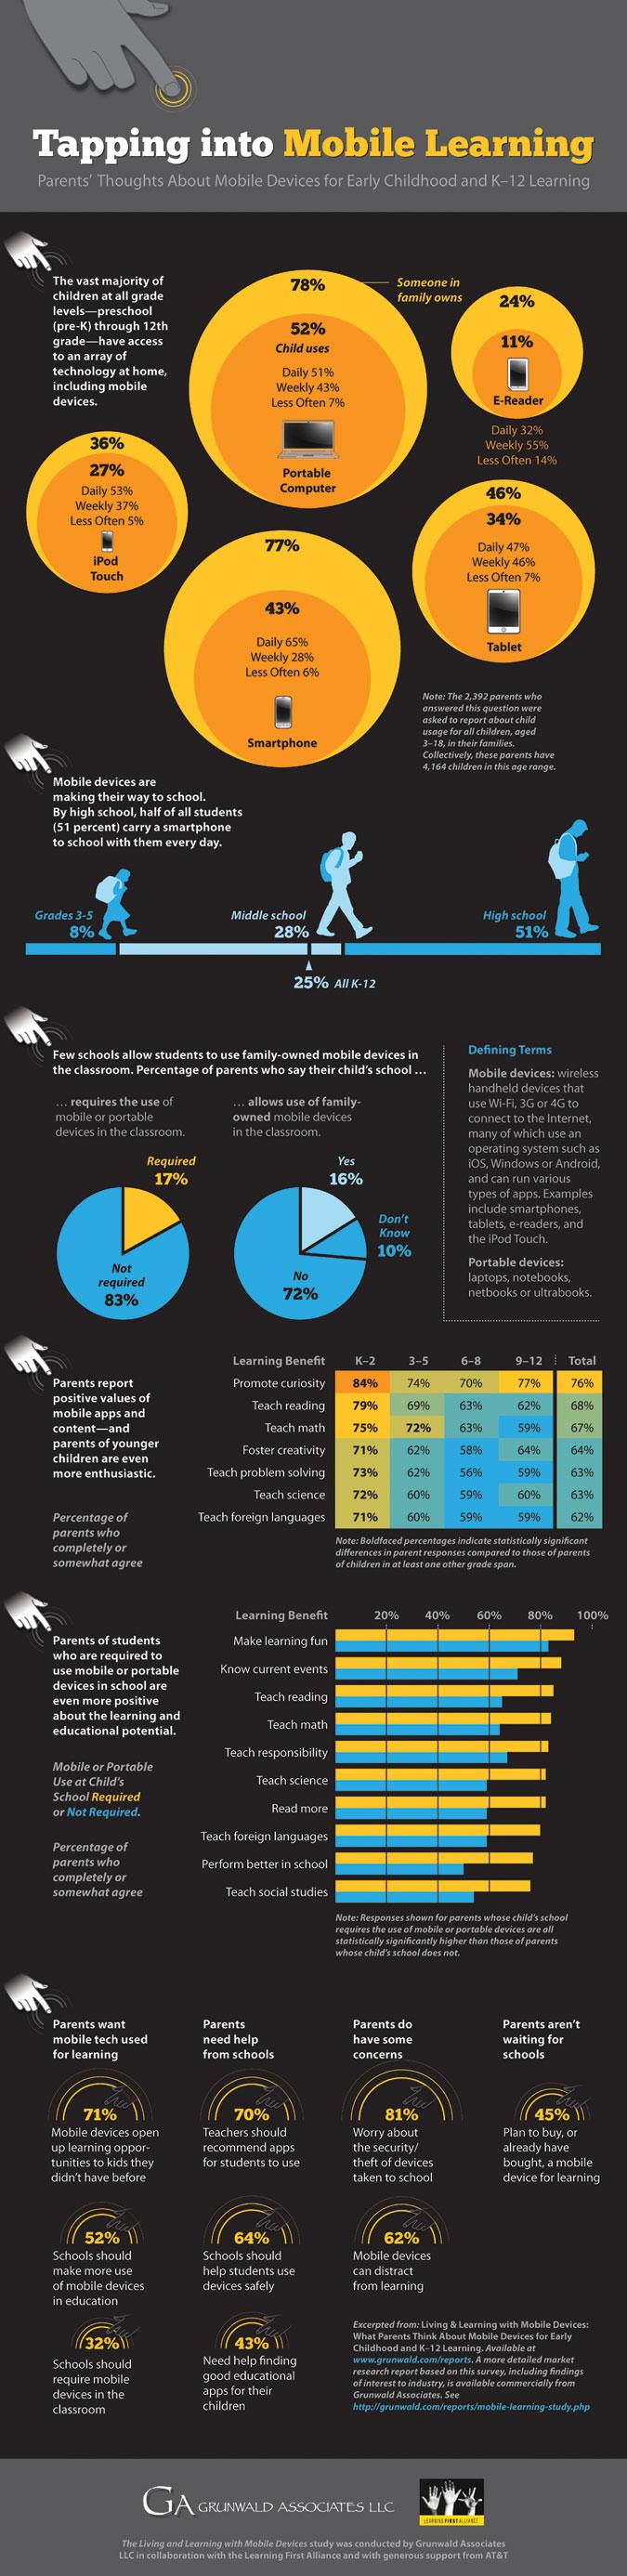 Grunwald-Mobile-Study-infographic